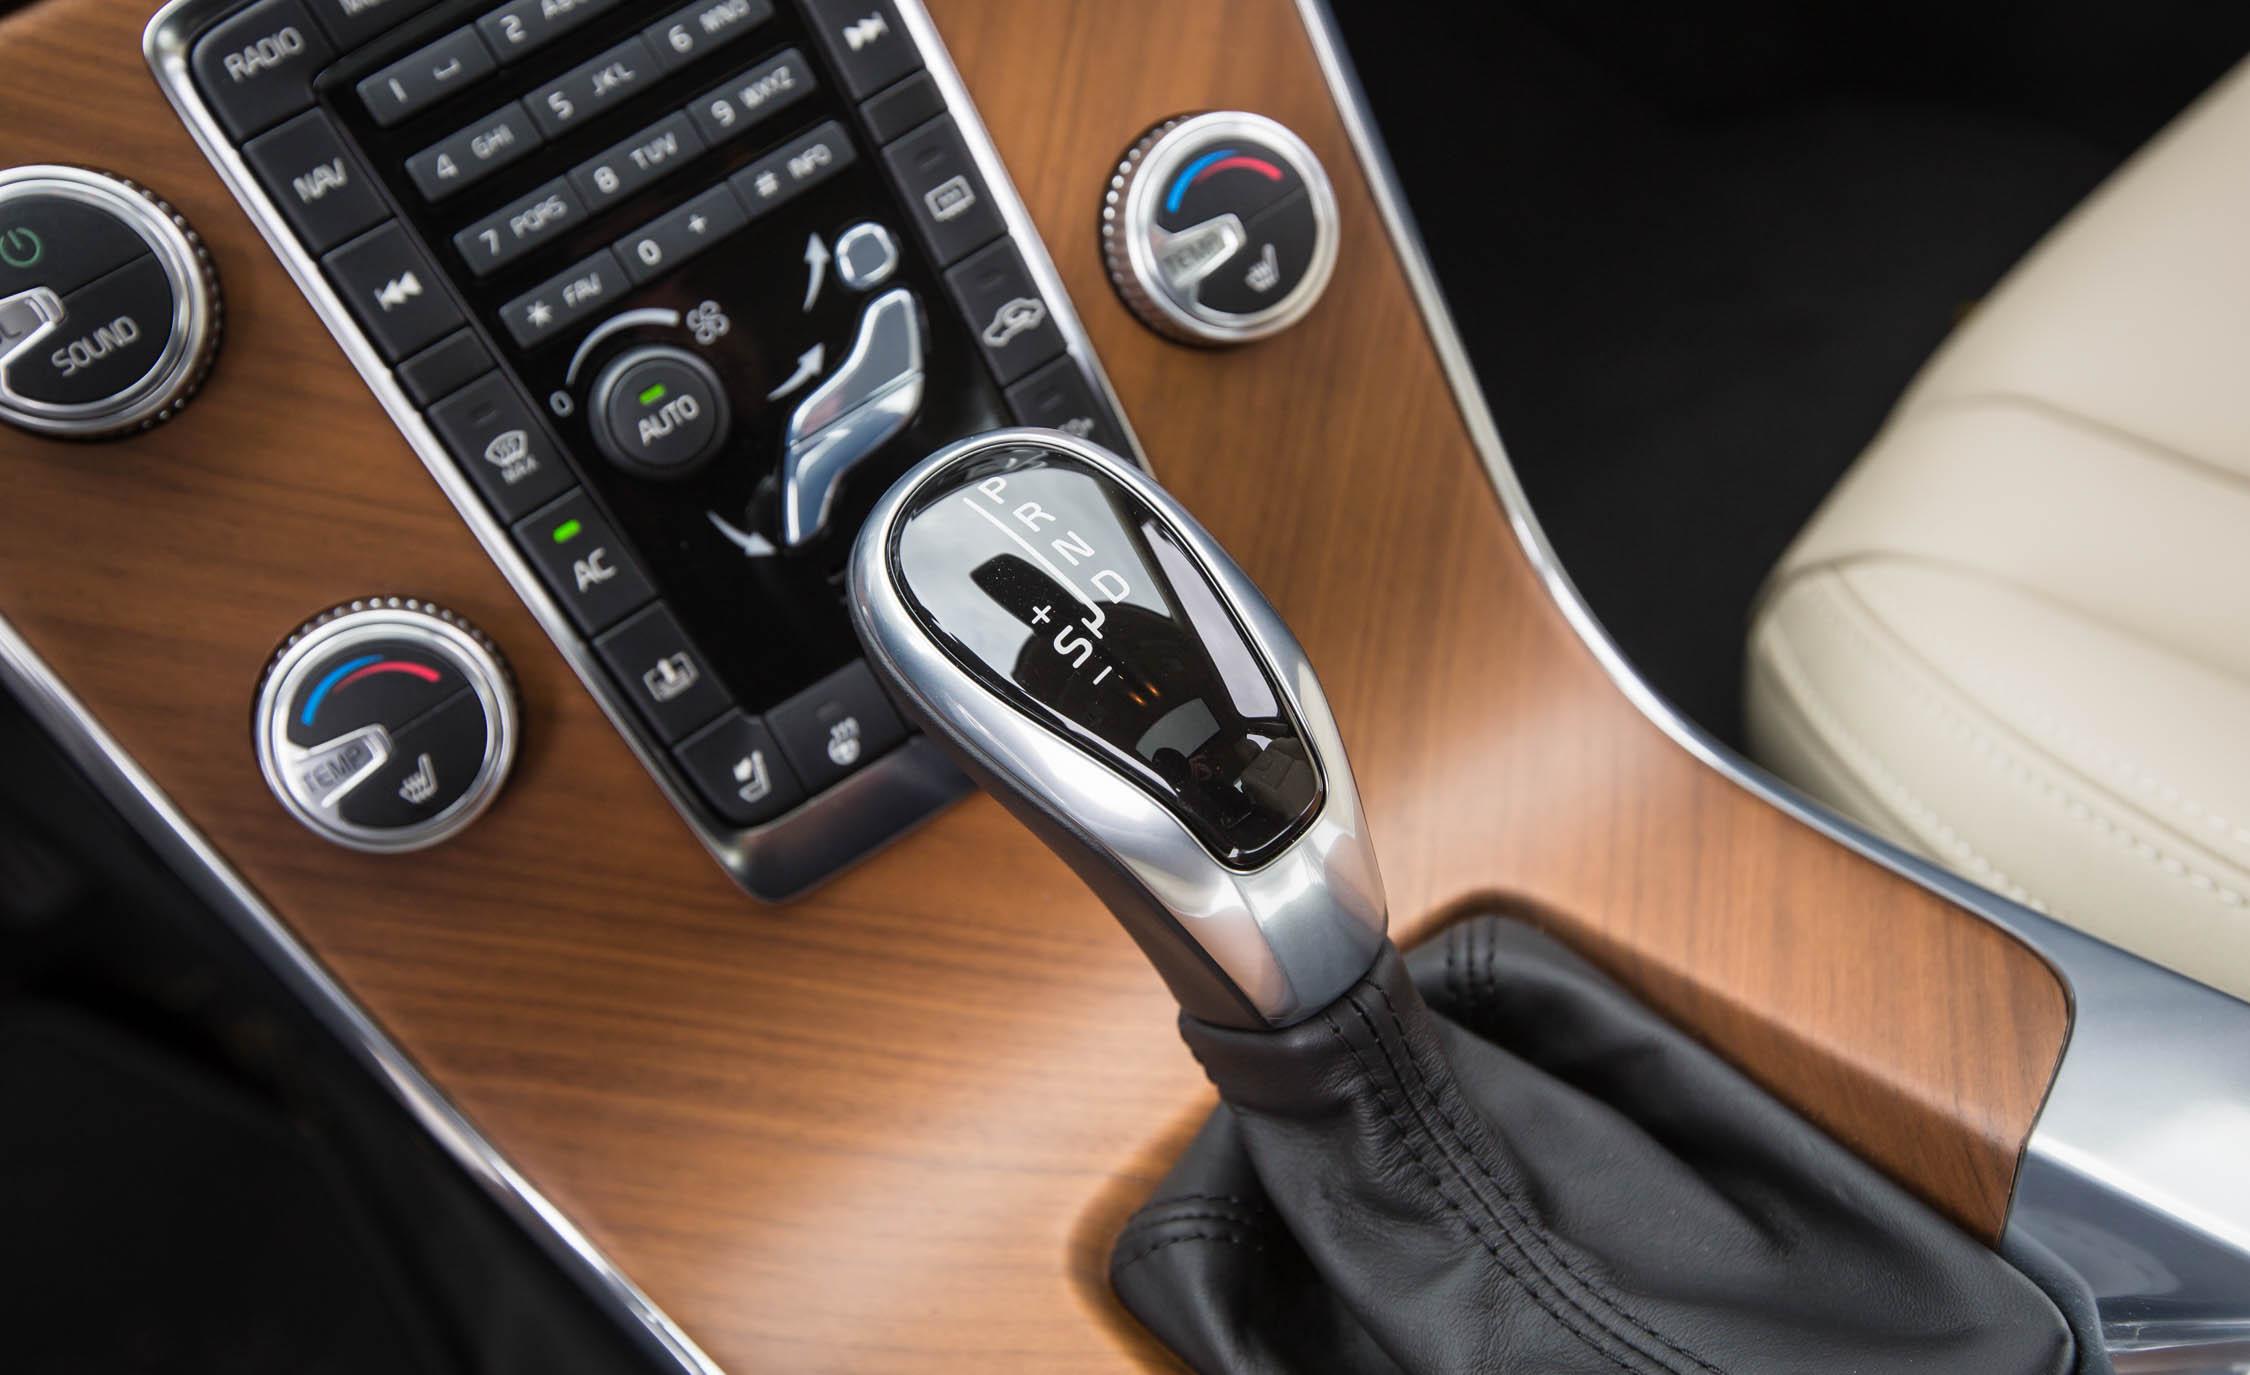 2016 Volvo S60 T5 Inscription Interior Gear Shift Knob